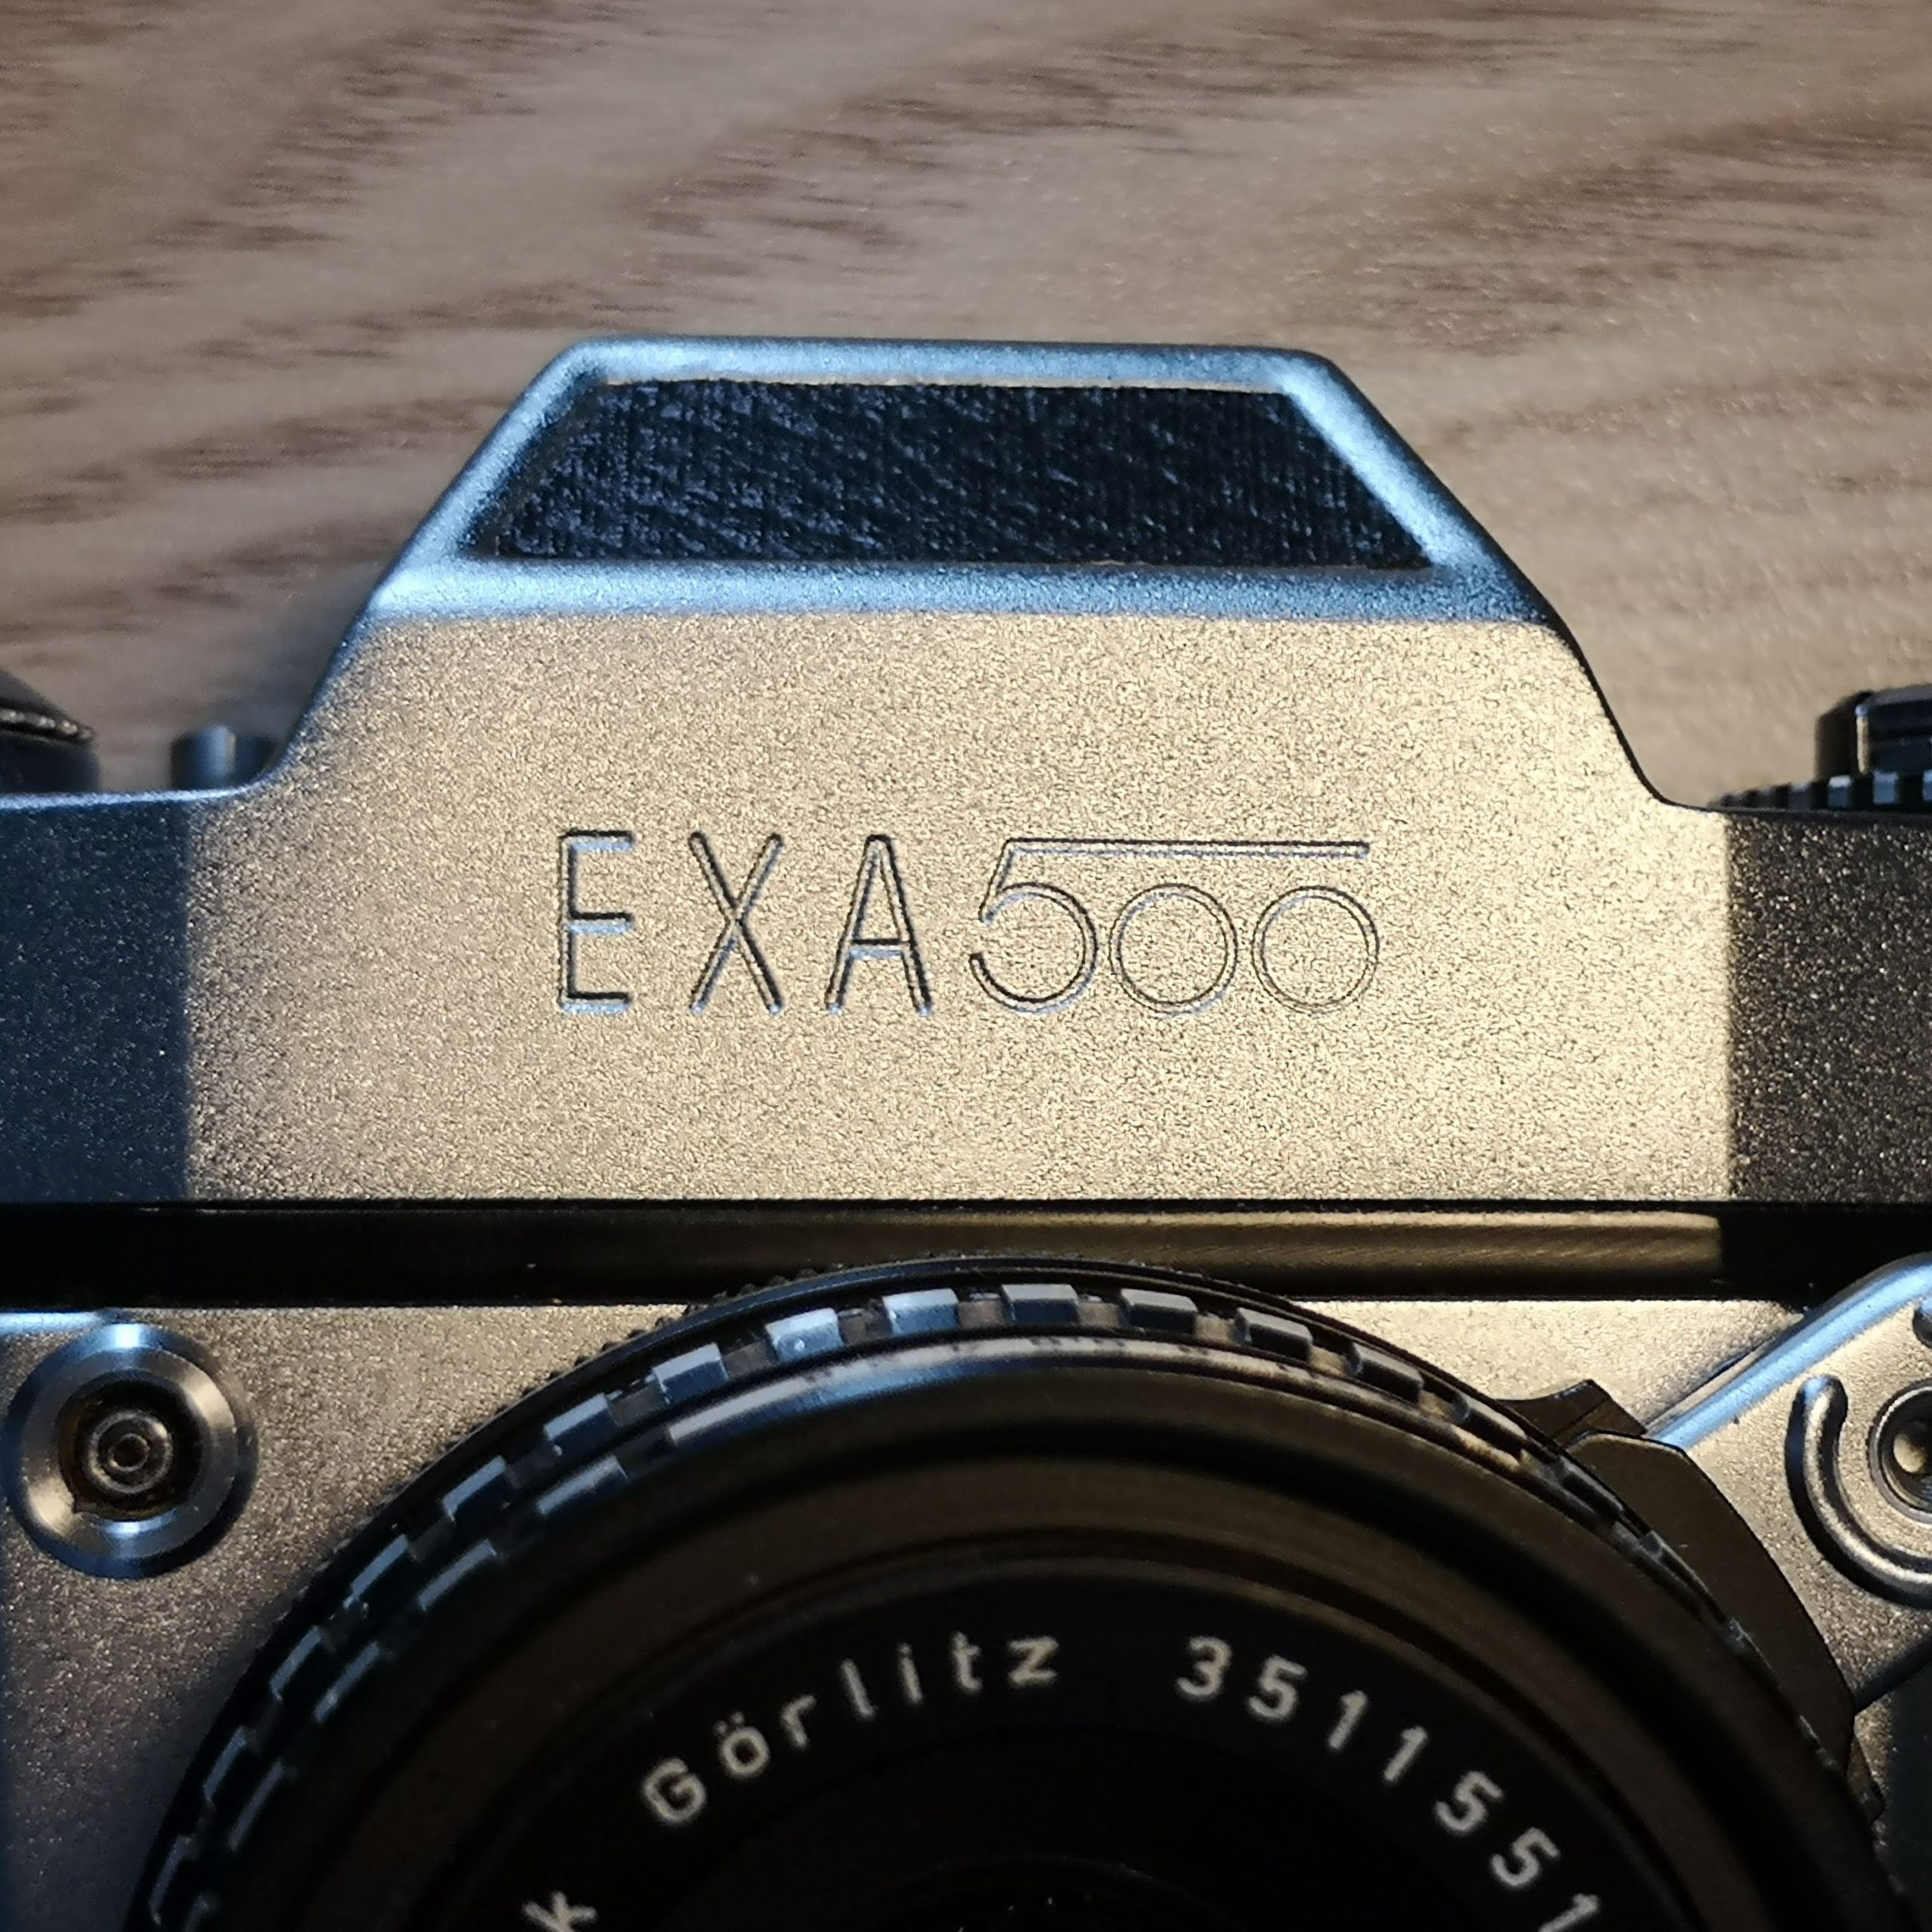 Exa 500 detail